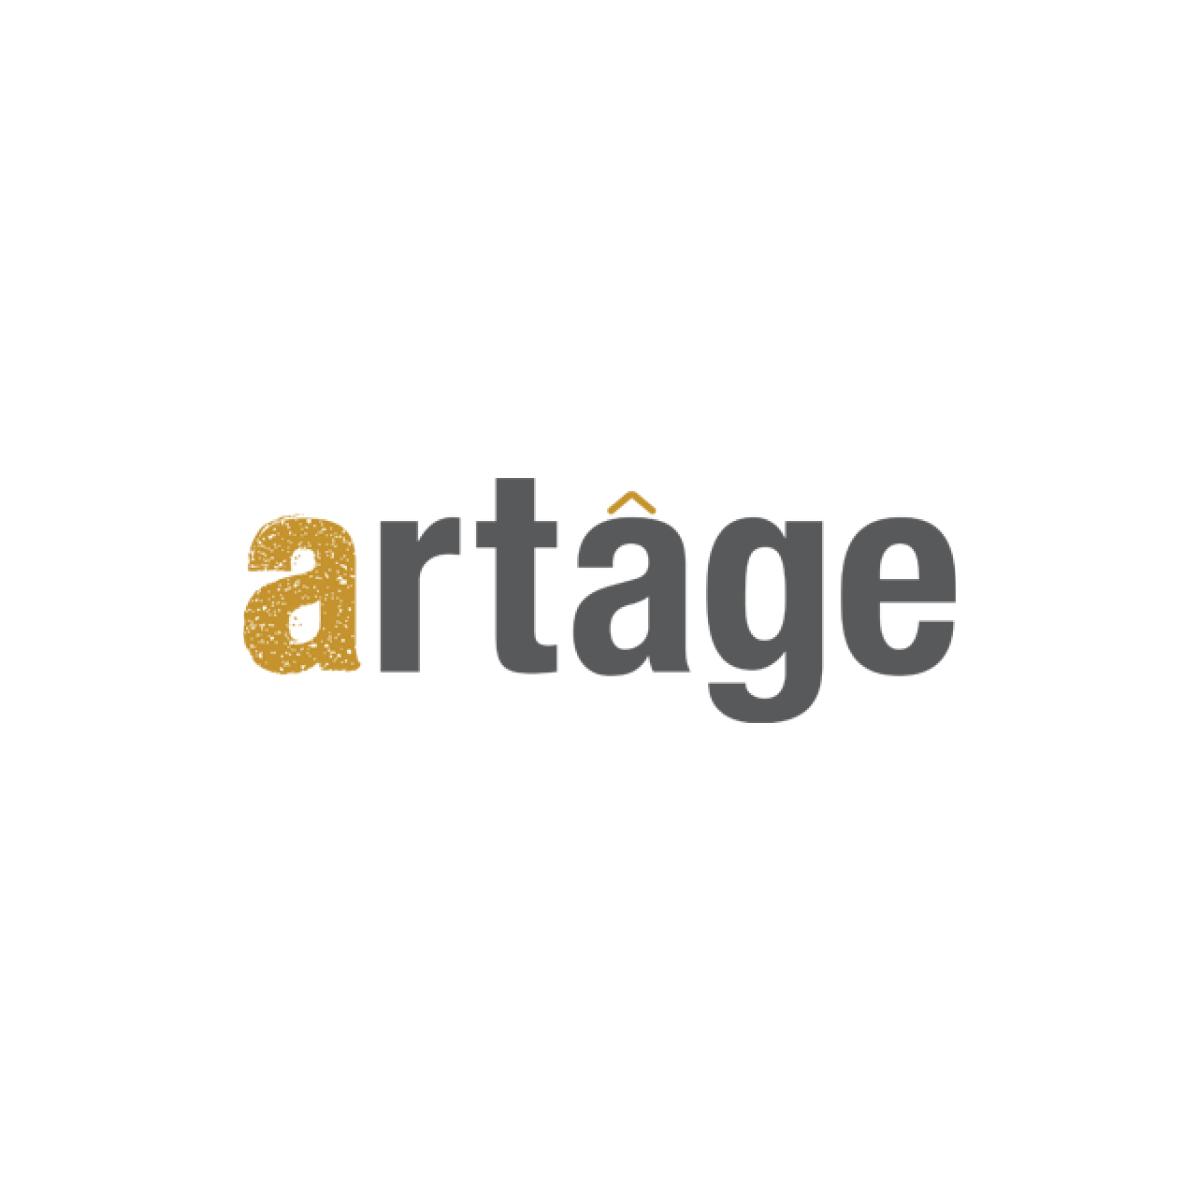 artage